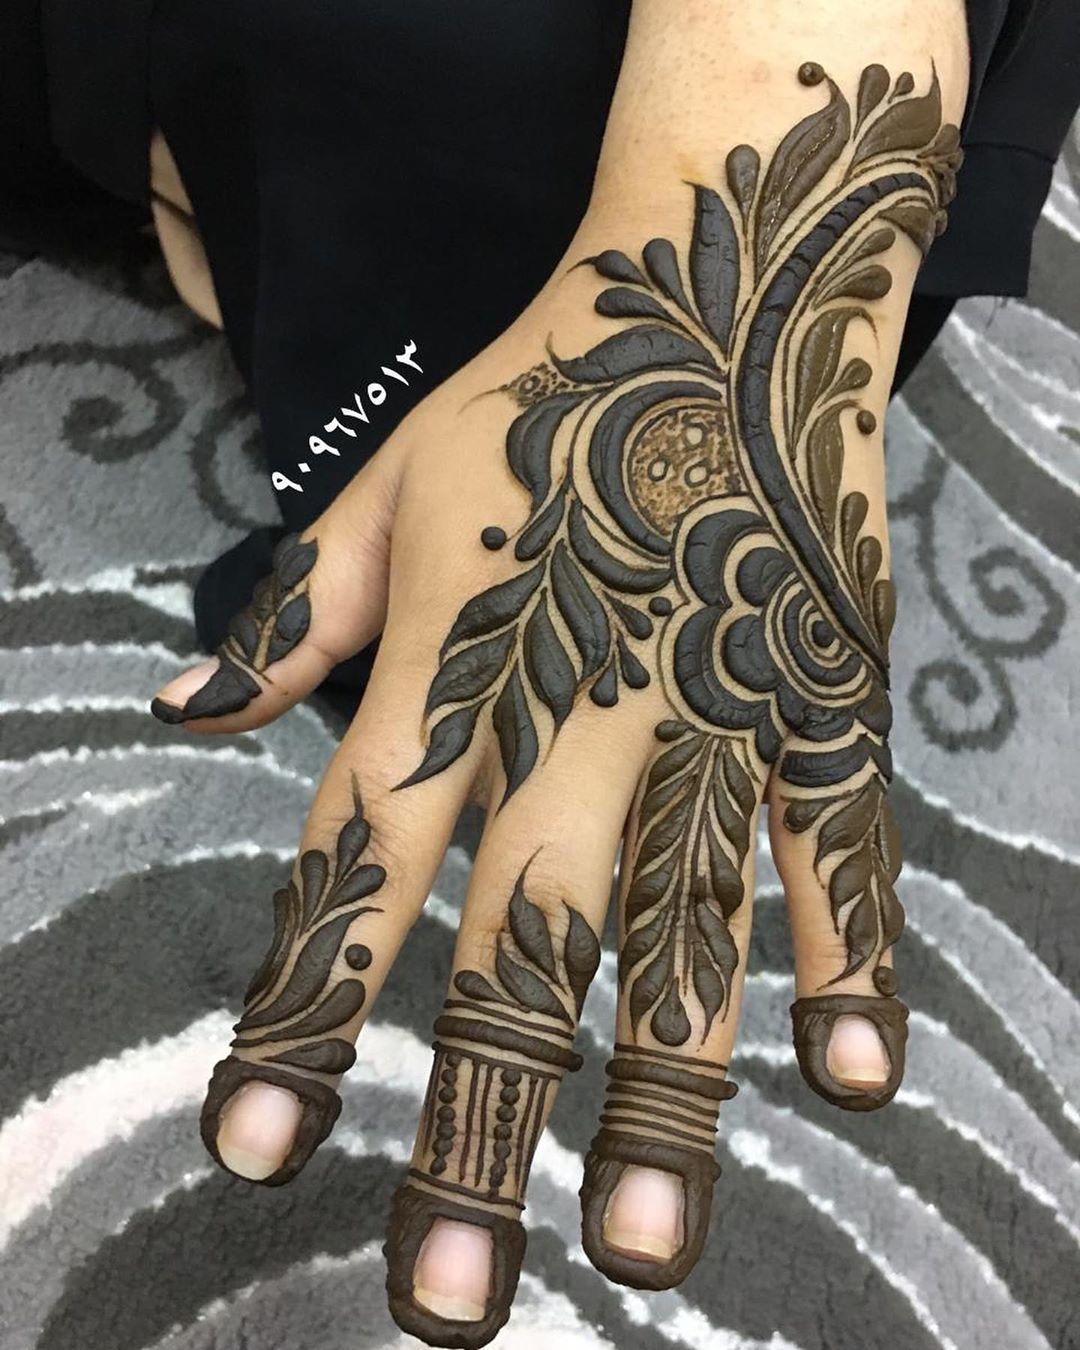 حناء شفاء الحوسني On Instagram حناء خليجي حنا حنه عروس حنايه نقوش حنا نقش ناعم نقش عرا Khafif Mehndi Design Wedding Henna Designs Floral Henna Designs